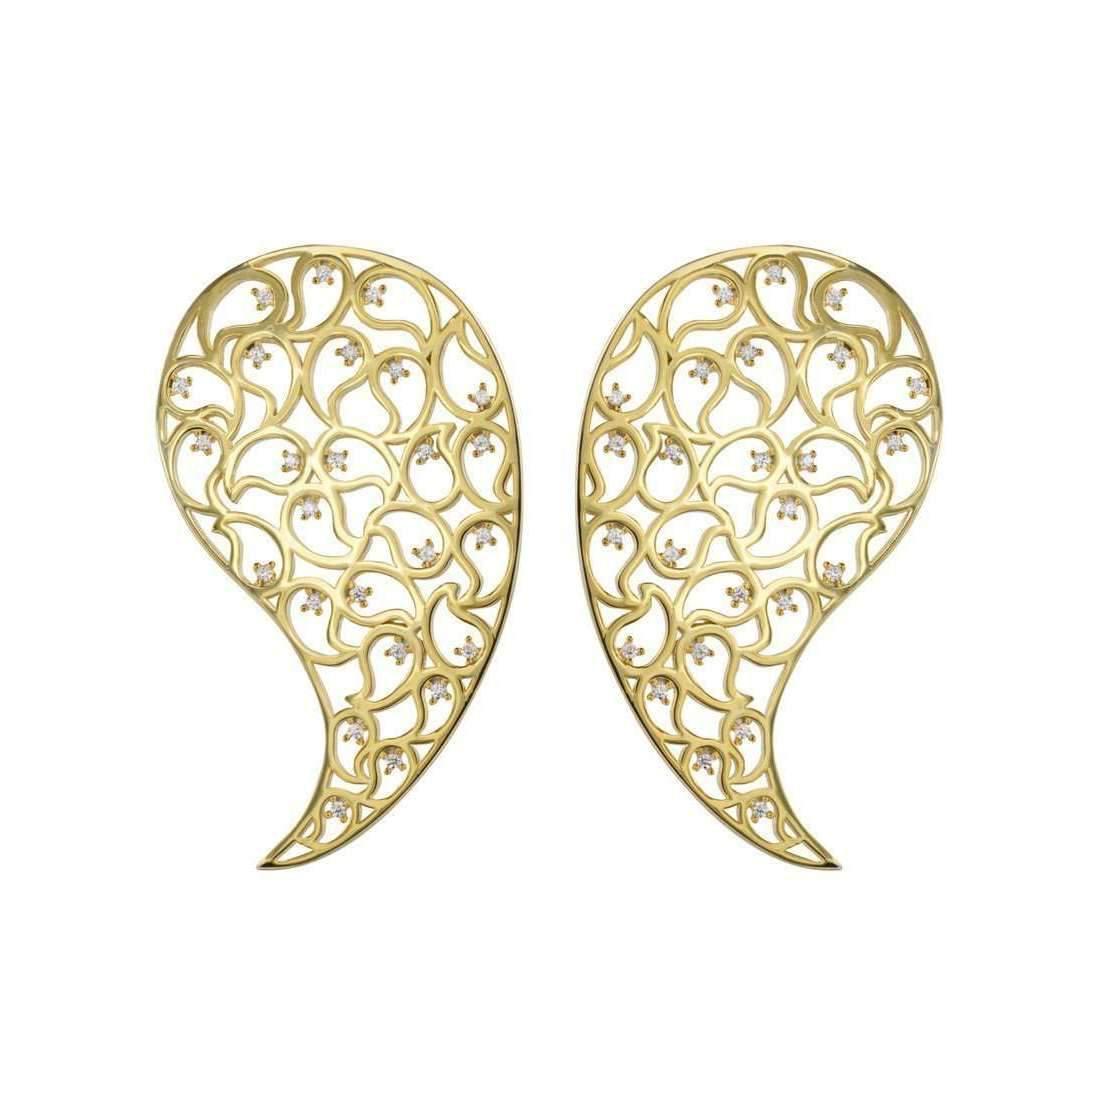 Sonal Bhaskaran Jaali Rose Gold Paisley Earrings with Clear Cubic Zirconia hb1gA